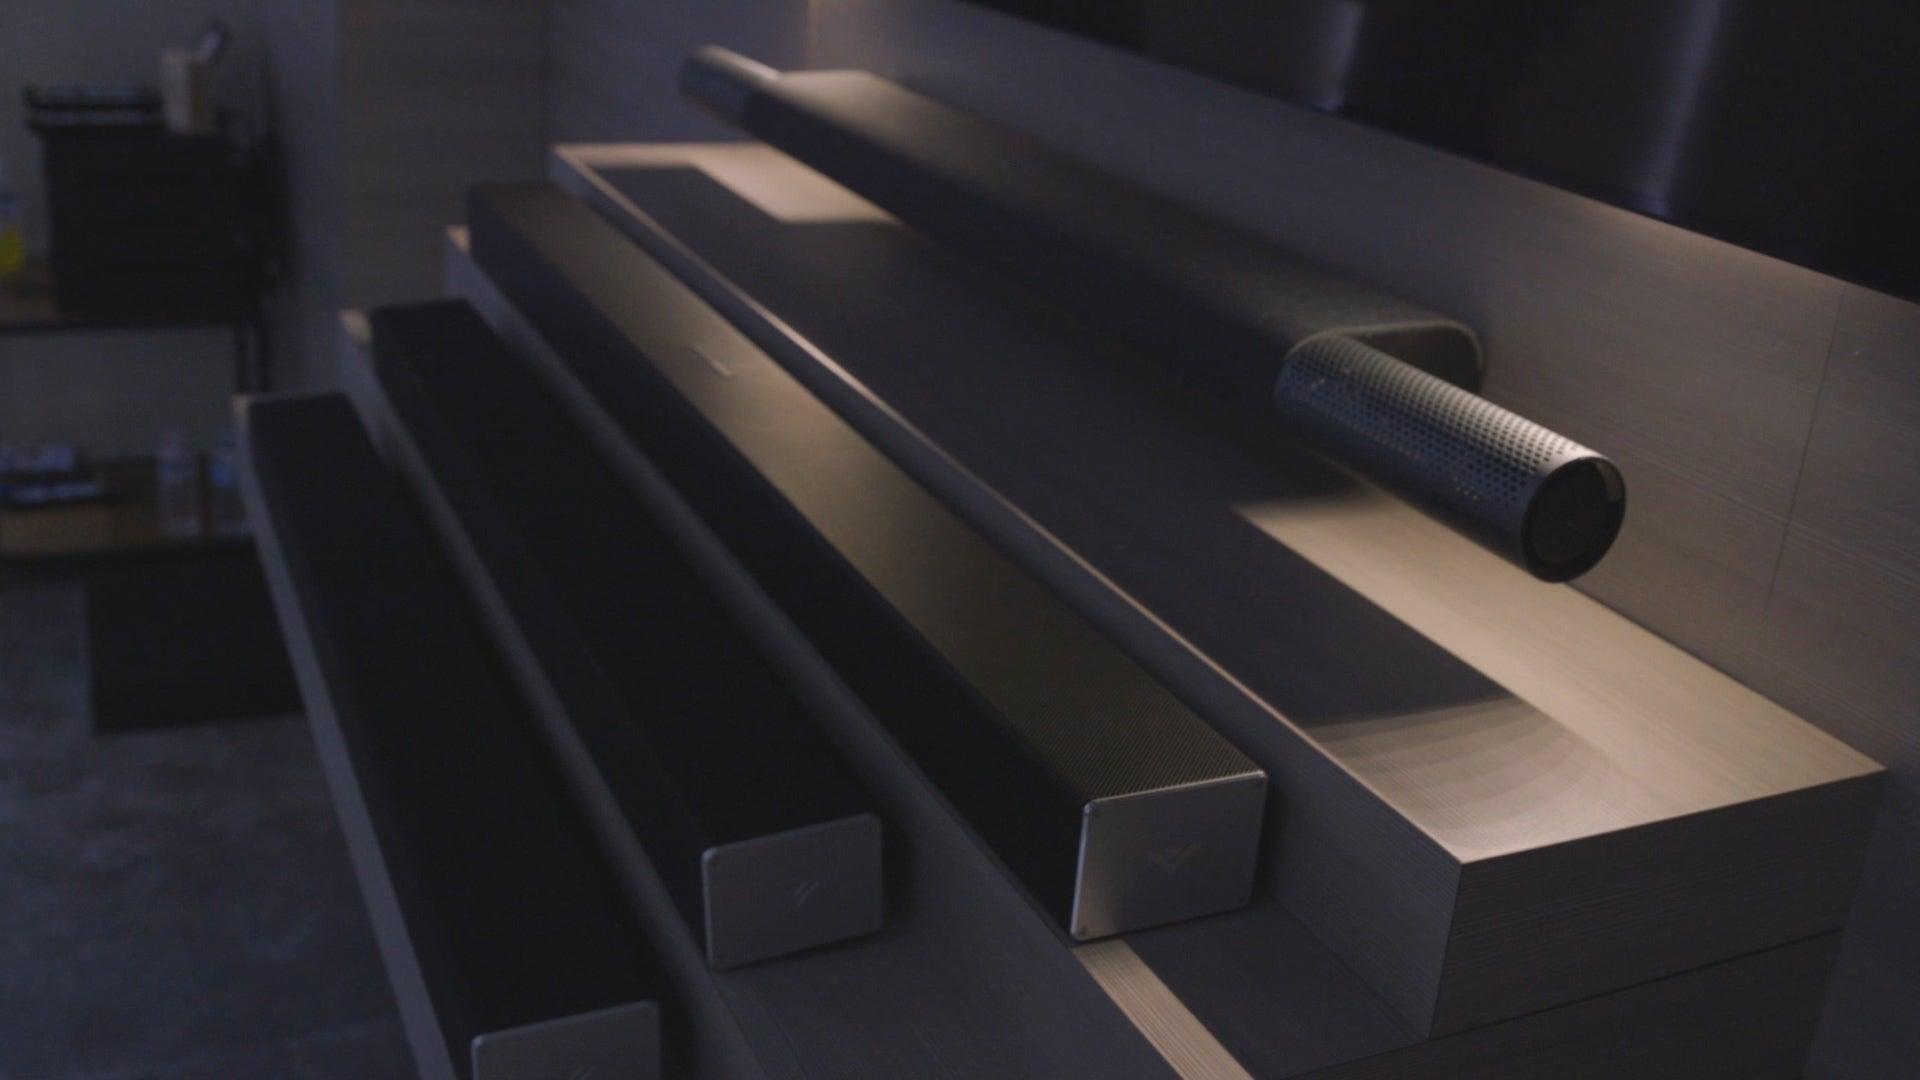 Vizio Has A Wacky Idea For Futuristic Dolby Atmos Soundbars